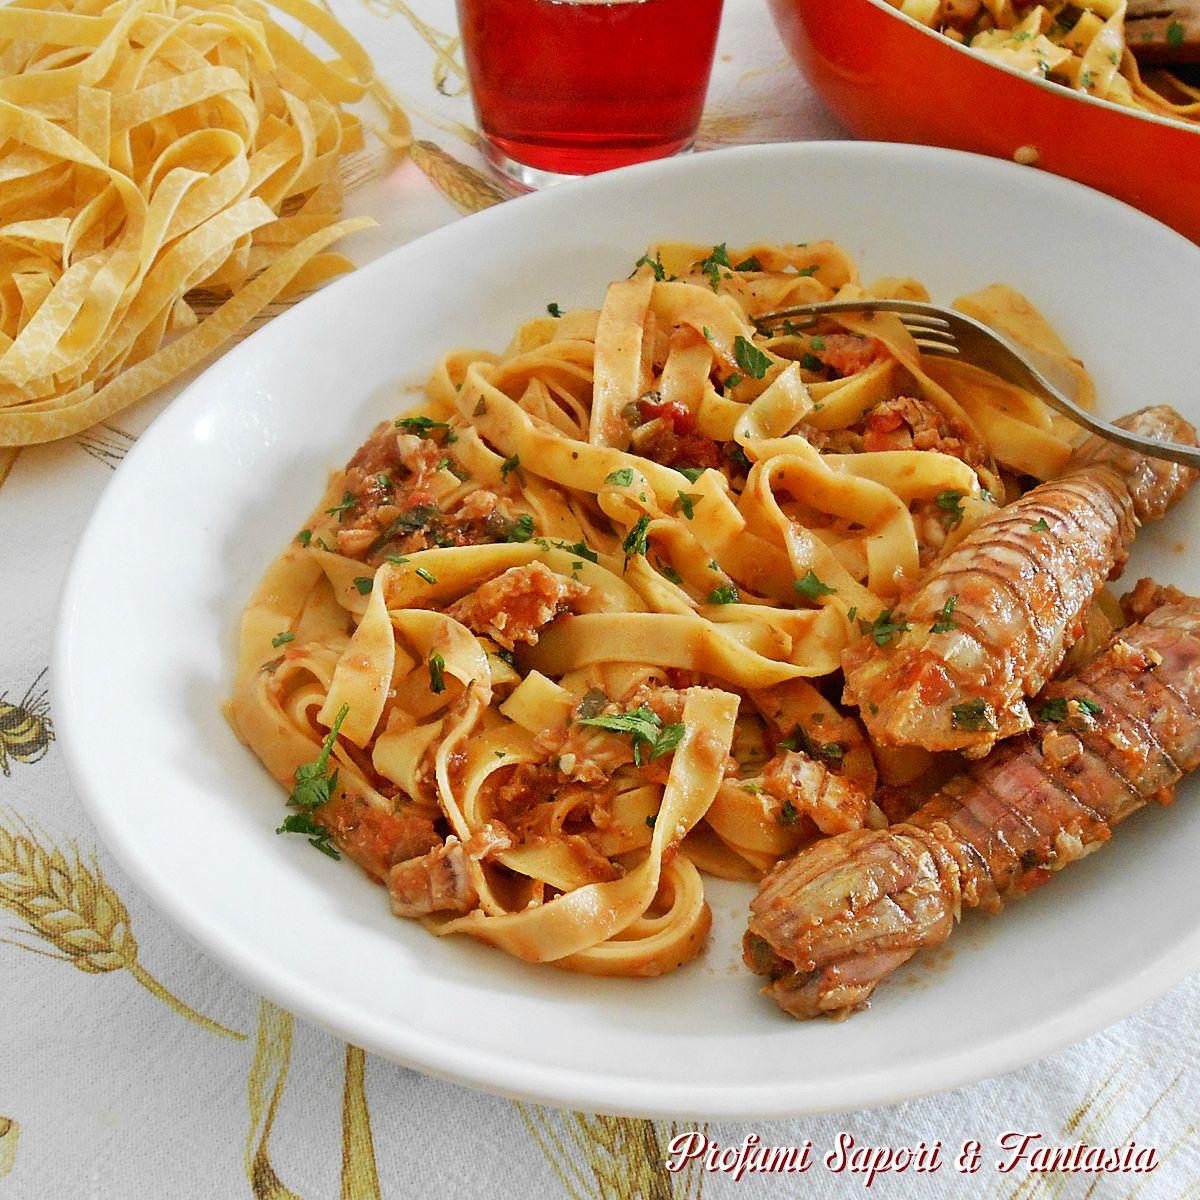 #Fettuccine with shrimp sauce - Fettuccine al sugo di canocchie ricetta gustosa